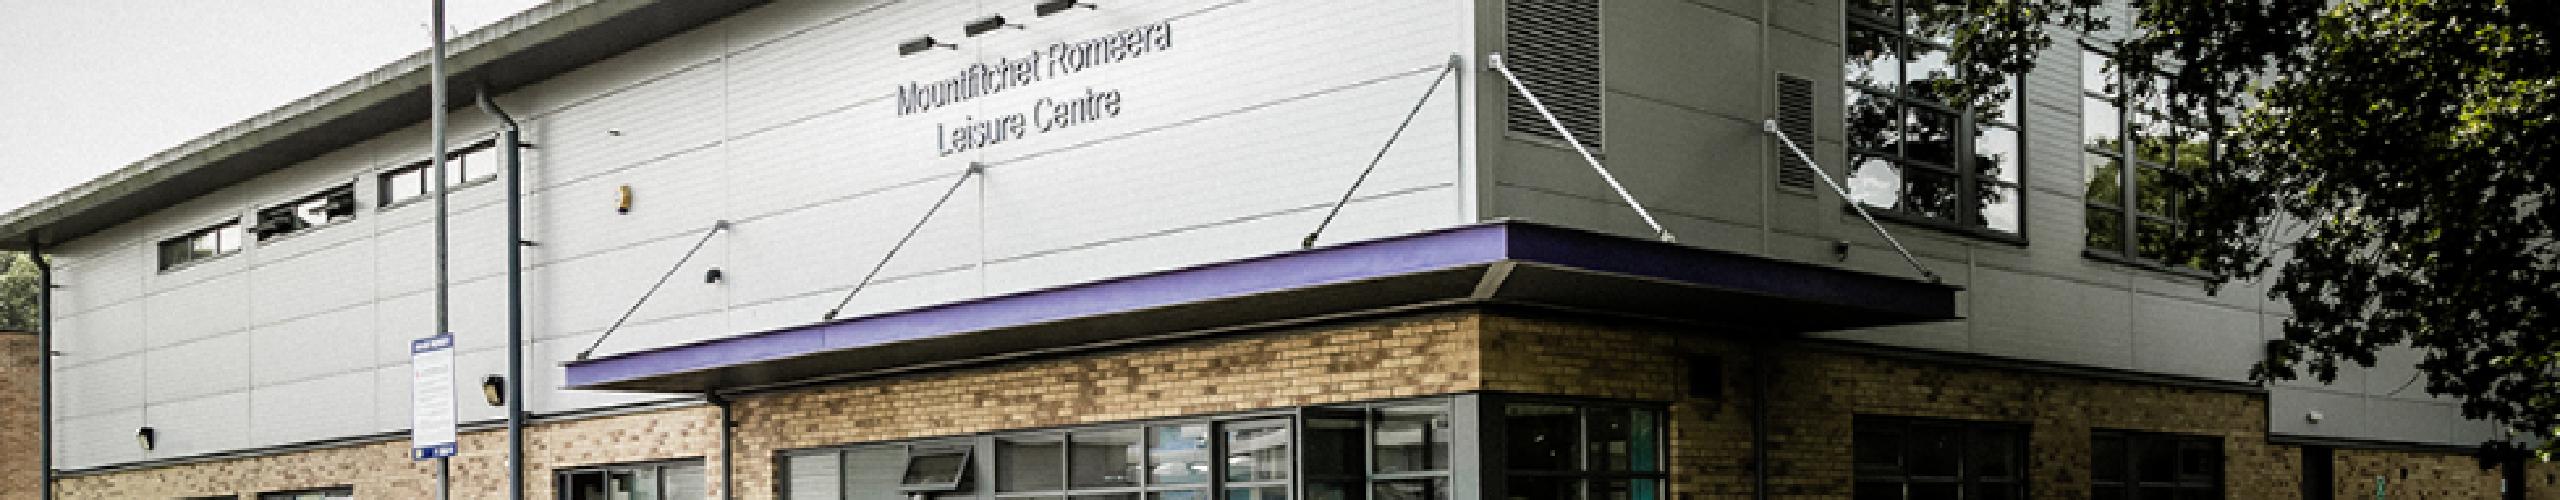 Mountfitchet Romeera Leisure Centre panel background